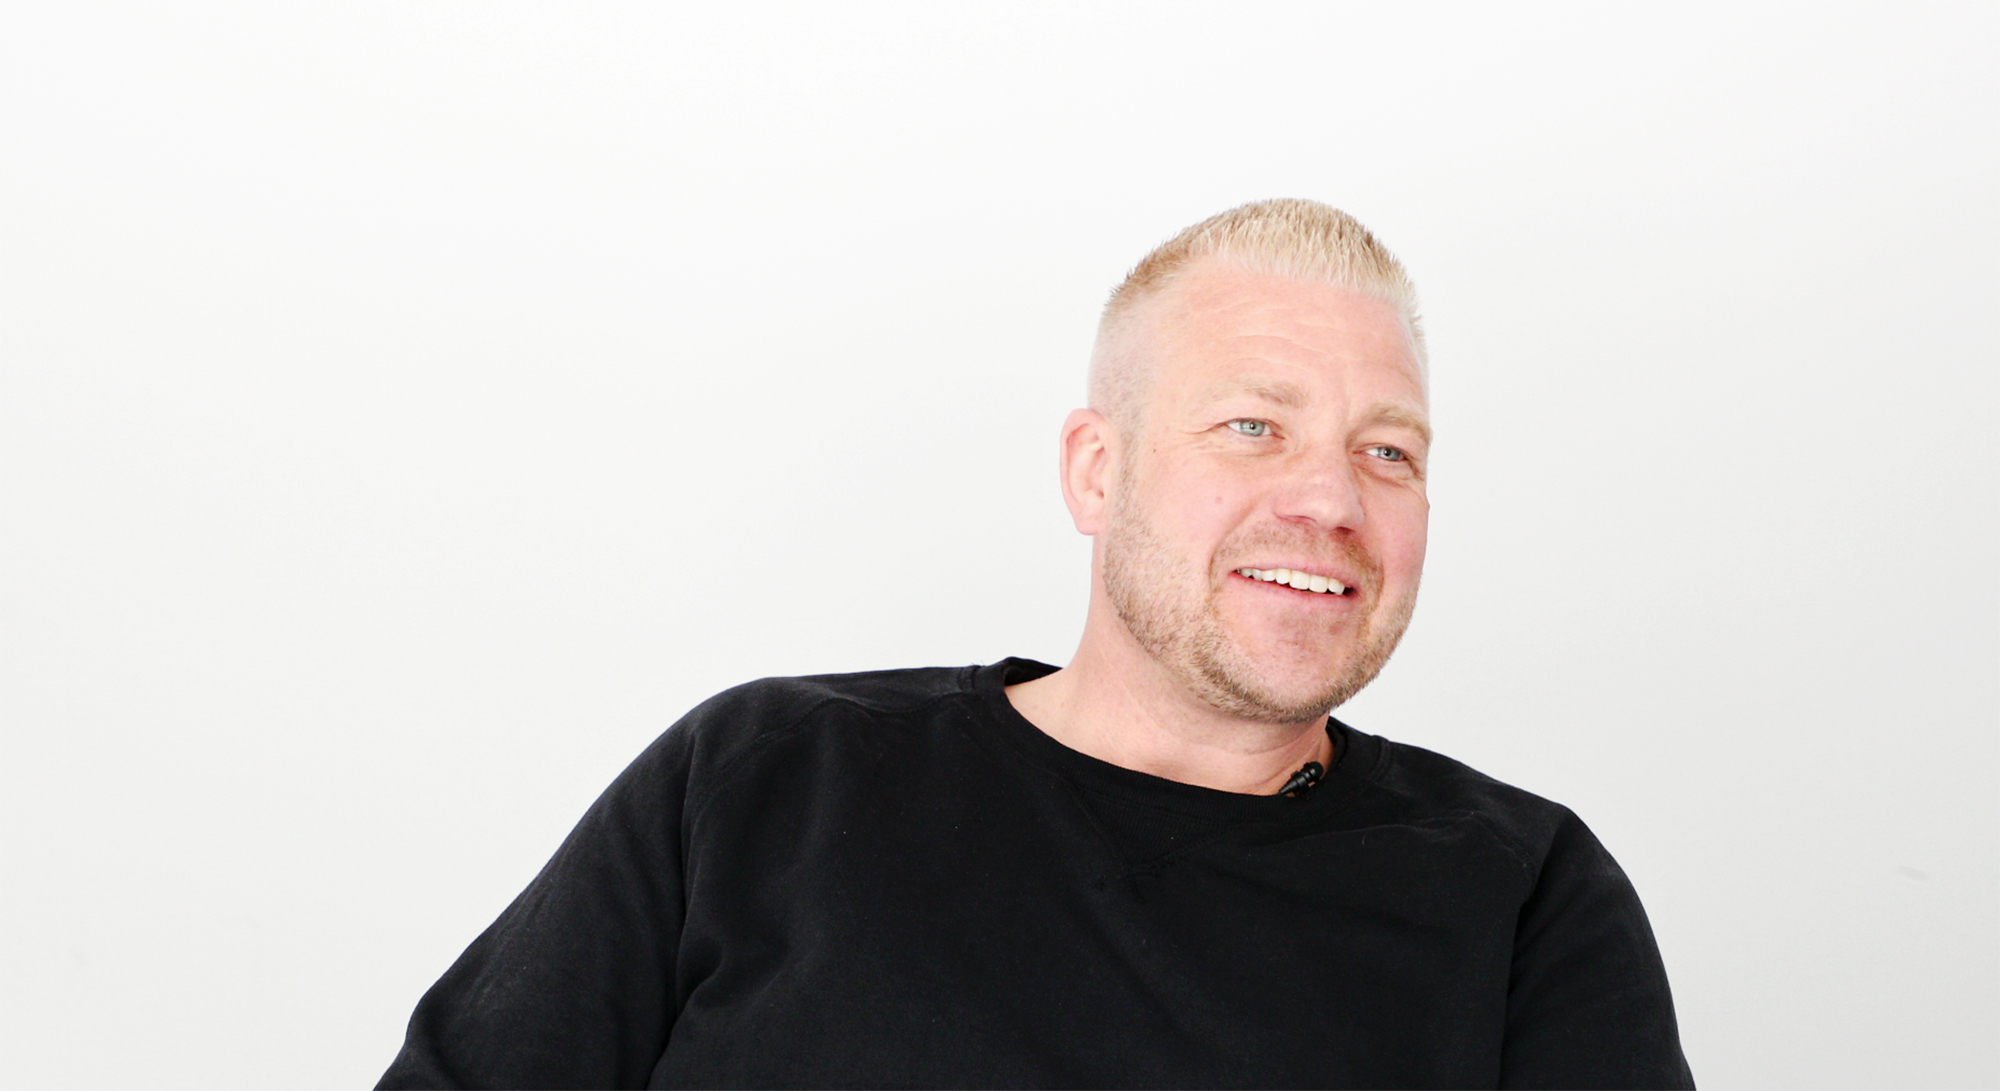 Tommy-Bergfors-JW-Rorservice-webben-1